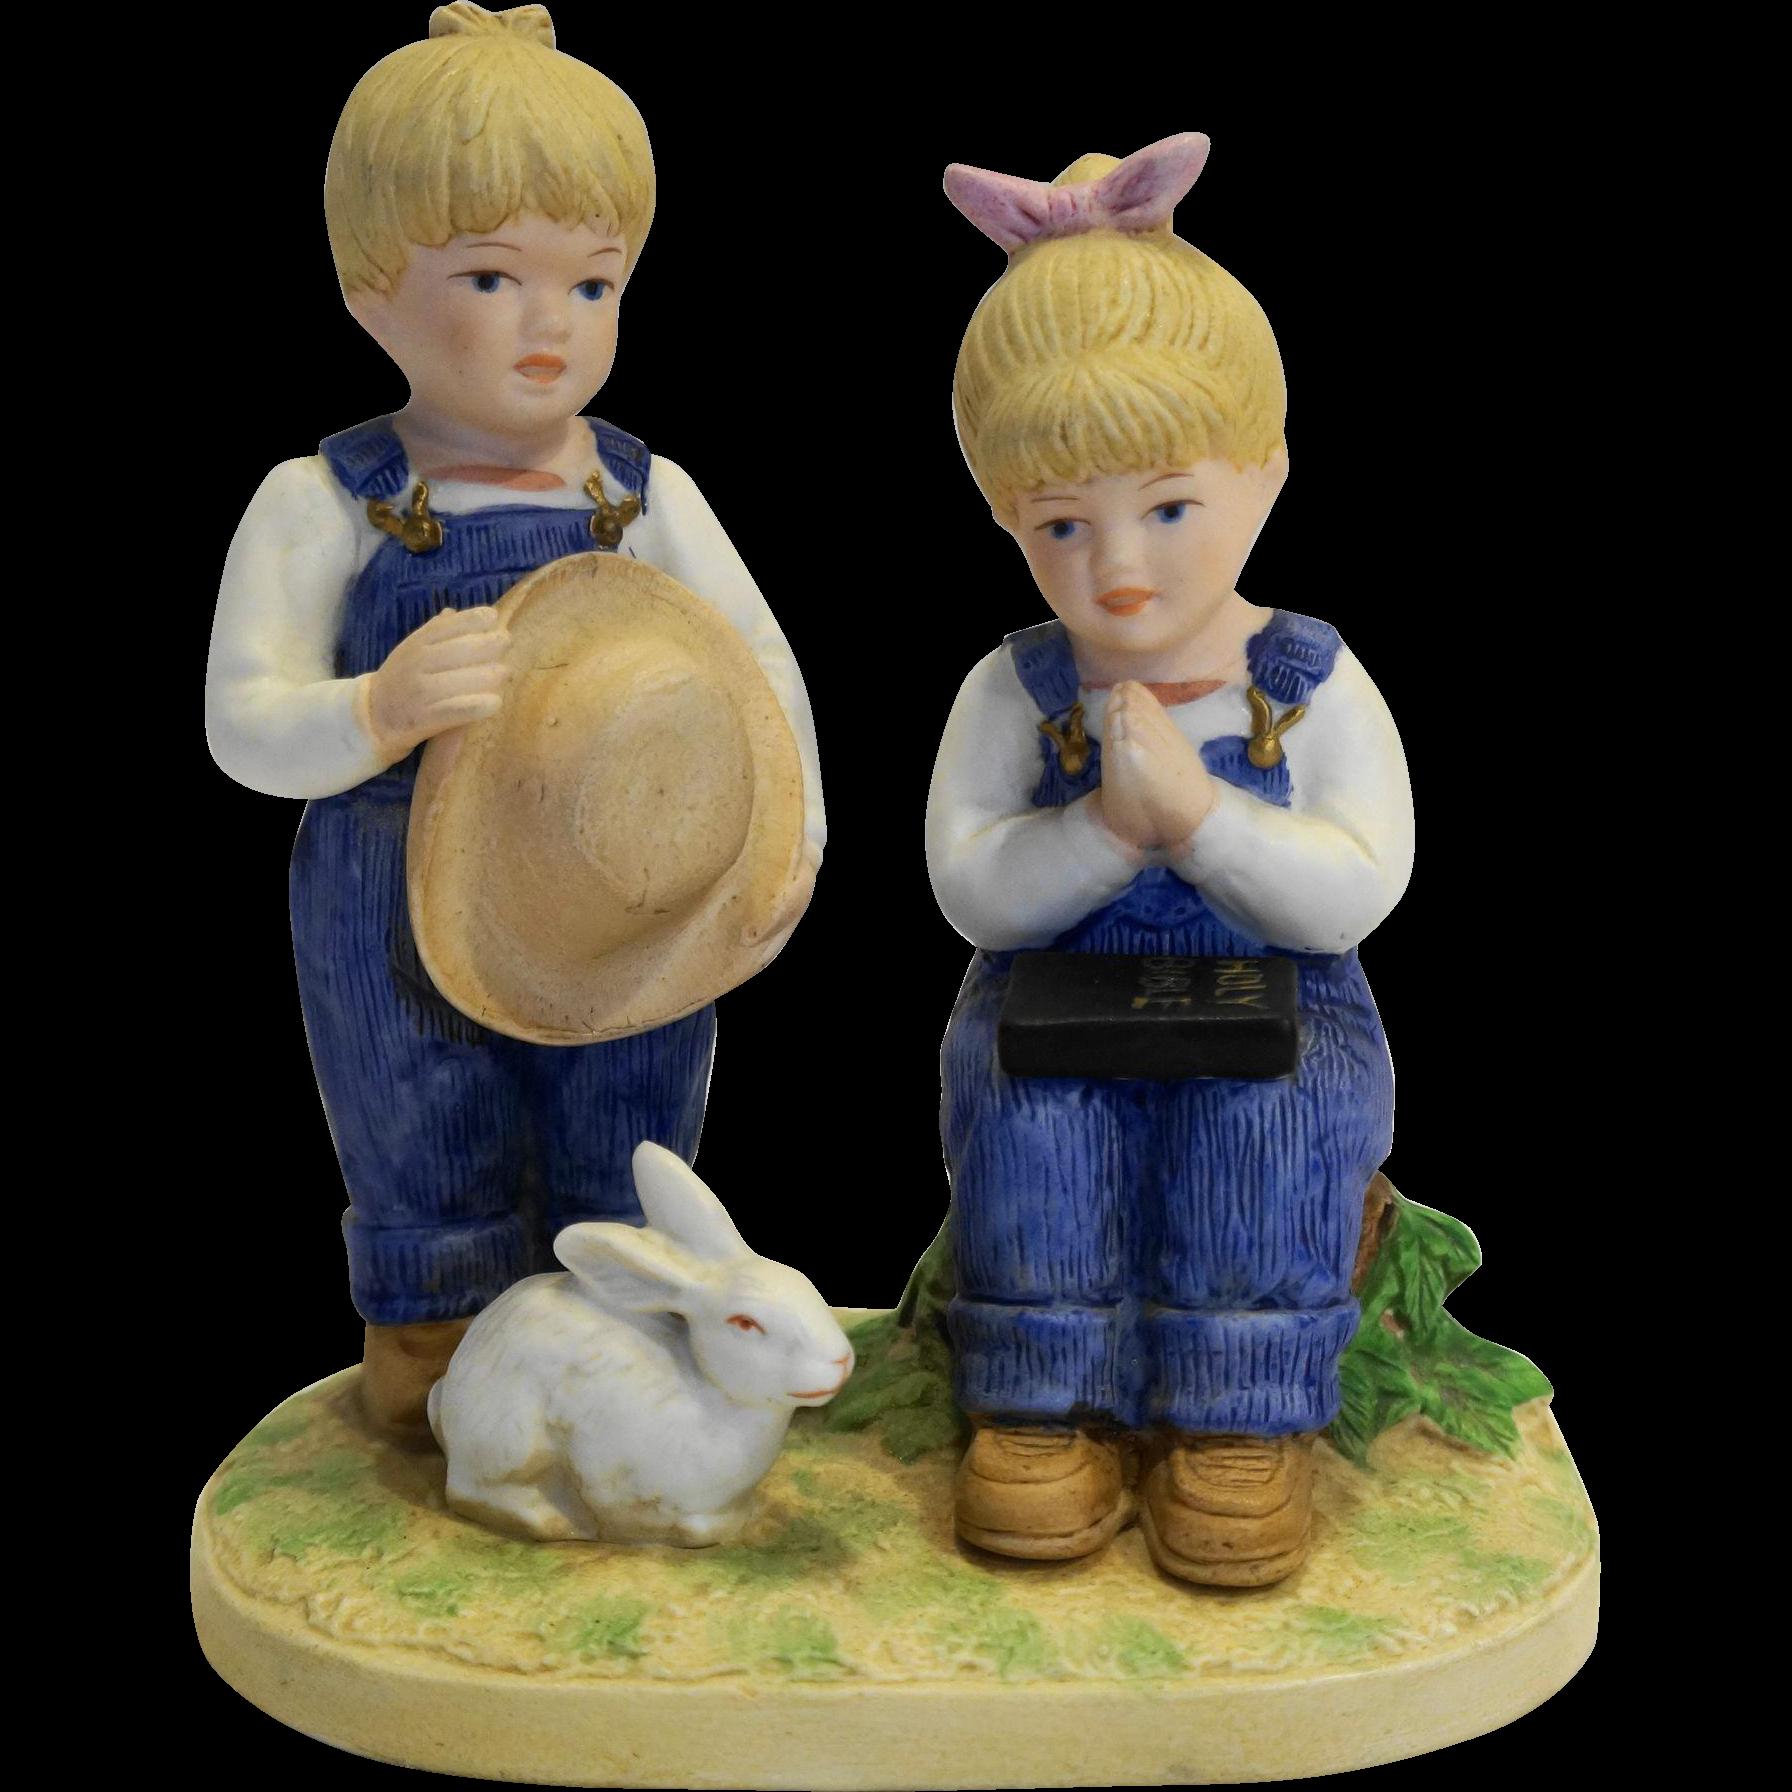 Home interior masterpiece figurines denim days jesus loves us  figurine homco made in taiwan